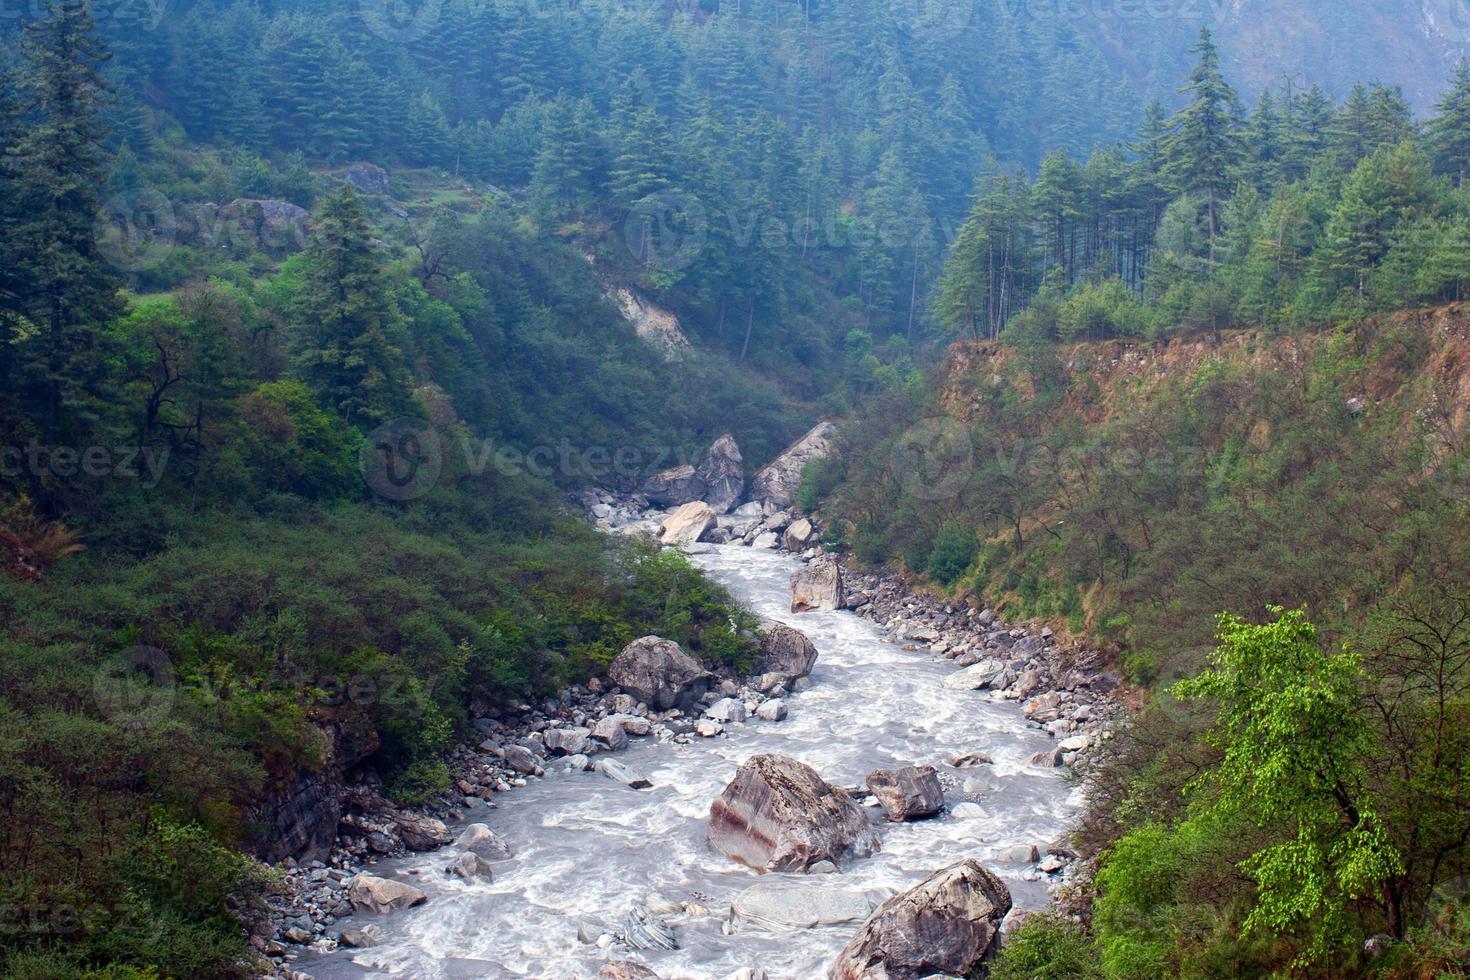 Kali Gandaki river, Nepal photo